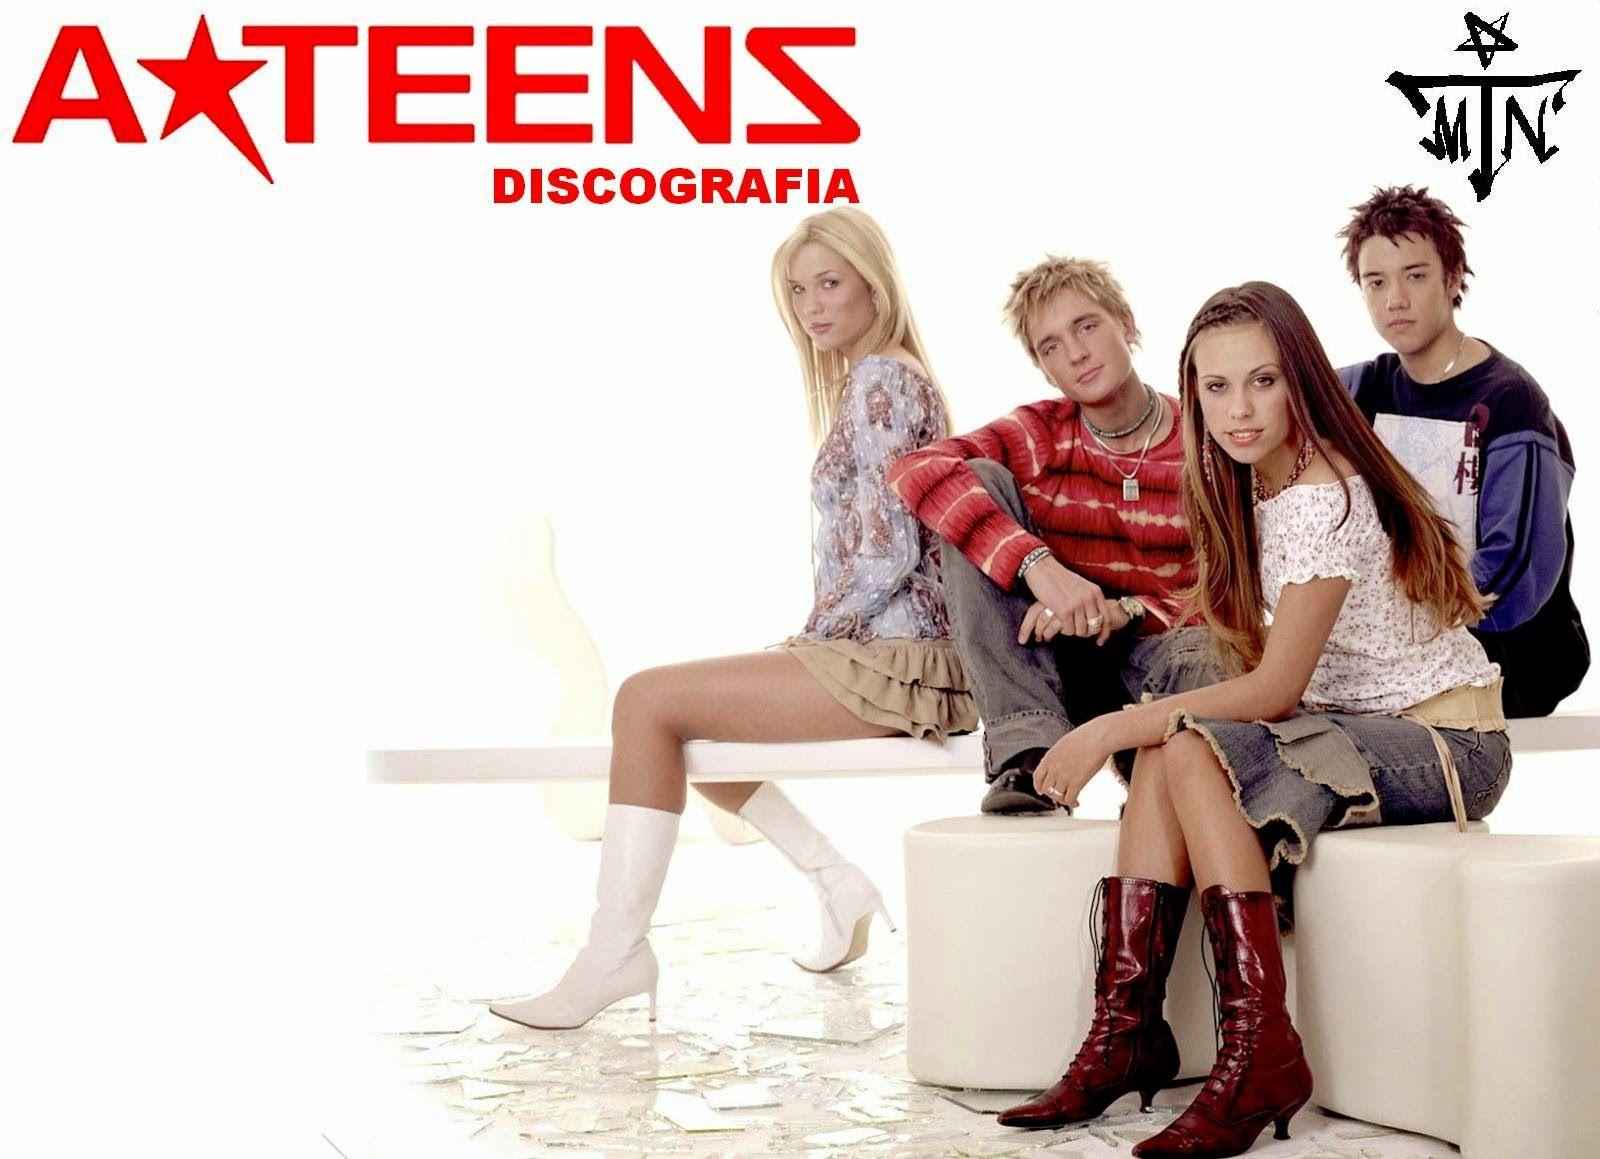 Discografia A Teens (DF) - Identi